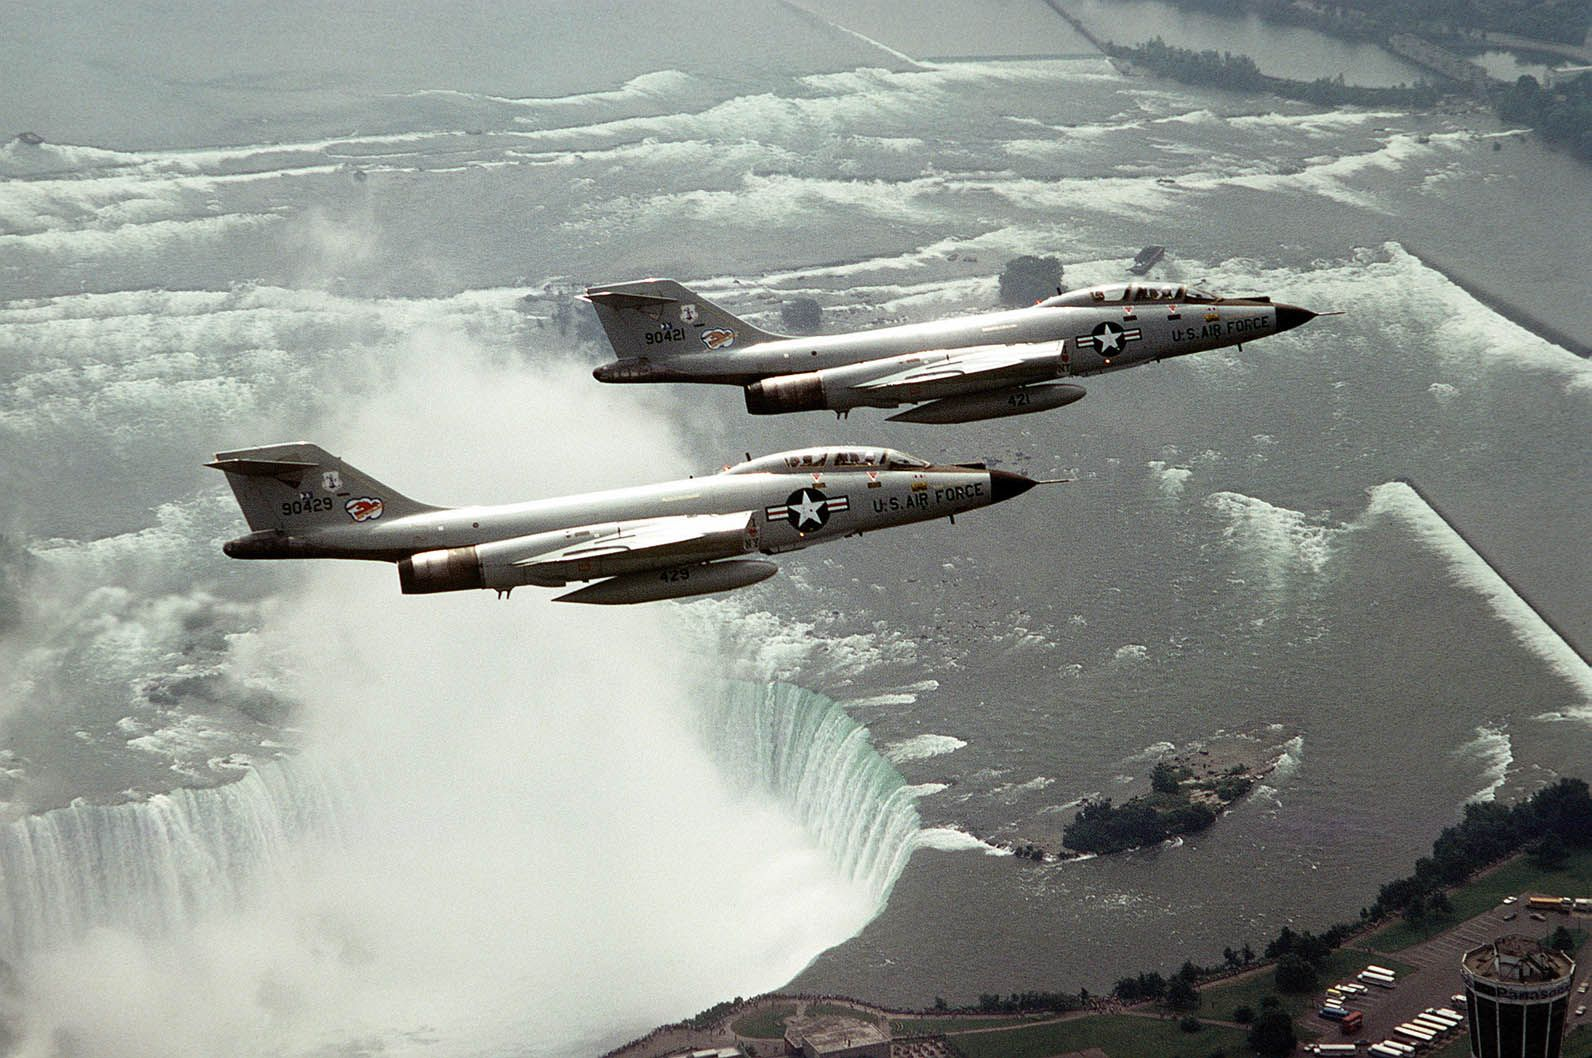 F-101 formation above the Niagara Falls